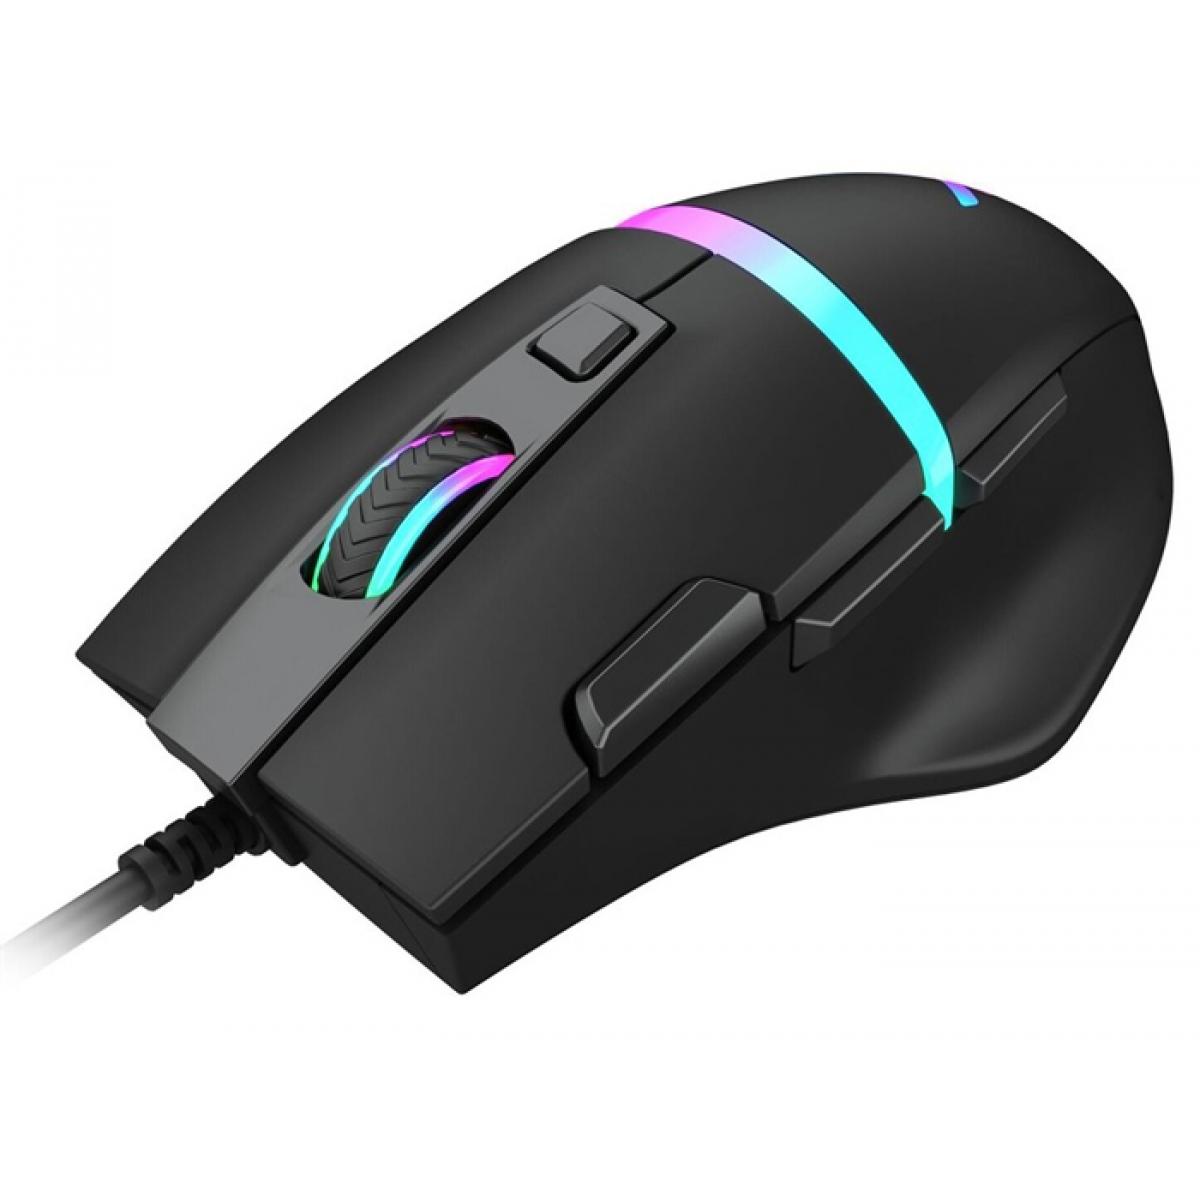 Mouse Gamer Dazz Legacy RGB, 6400 DPI, 3 Botões Programáveis, Black